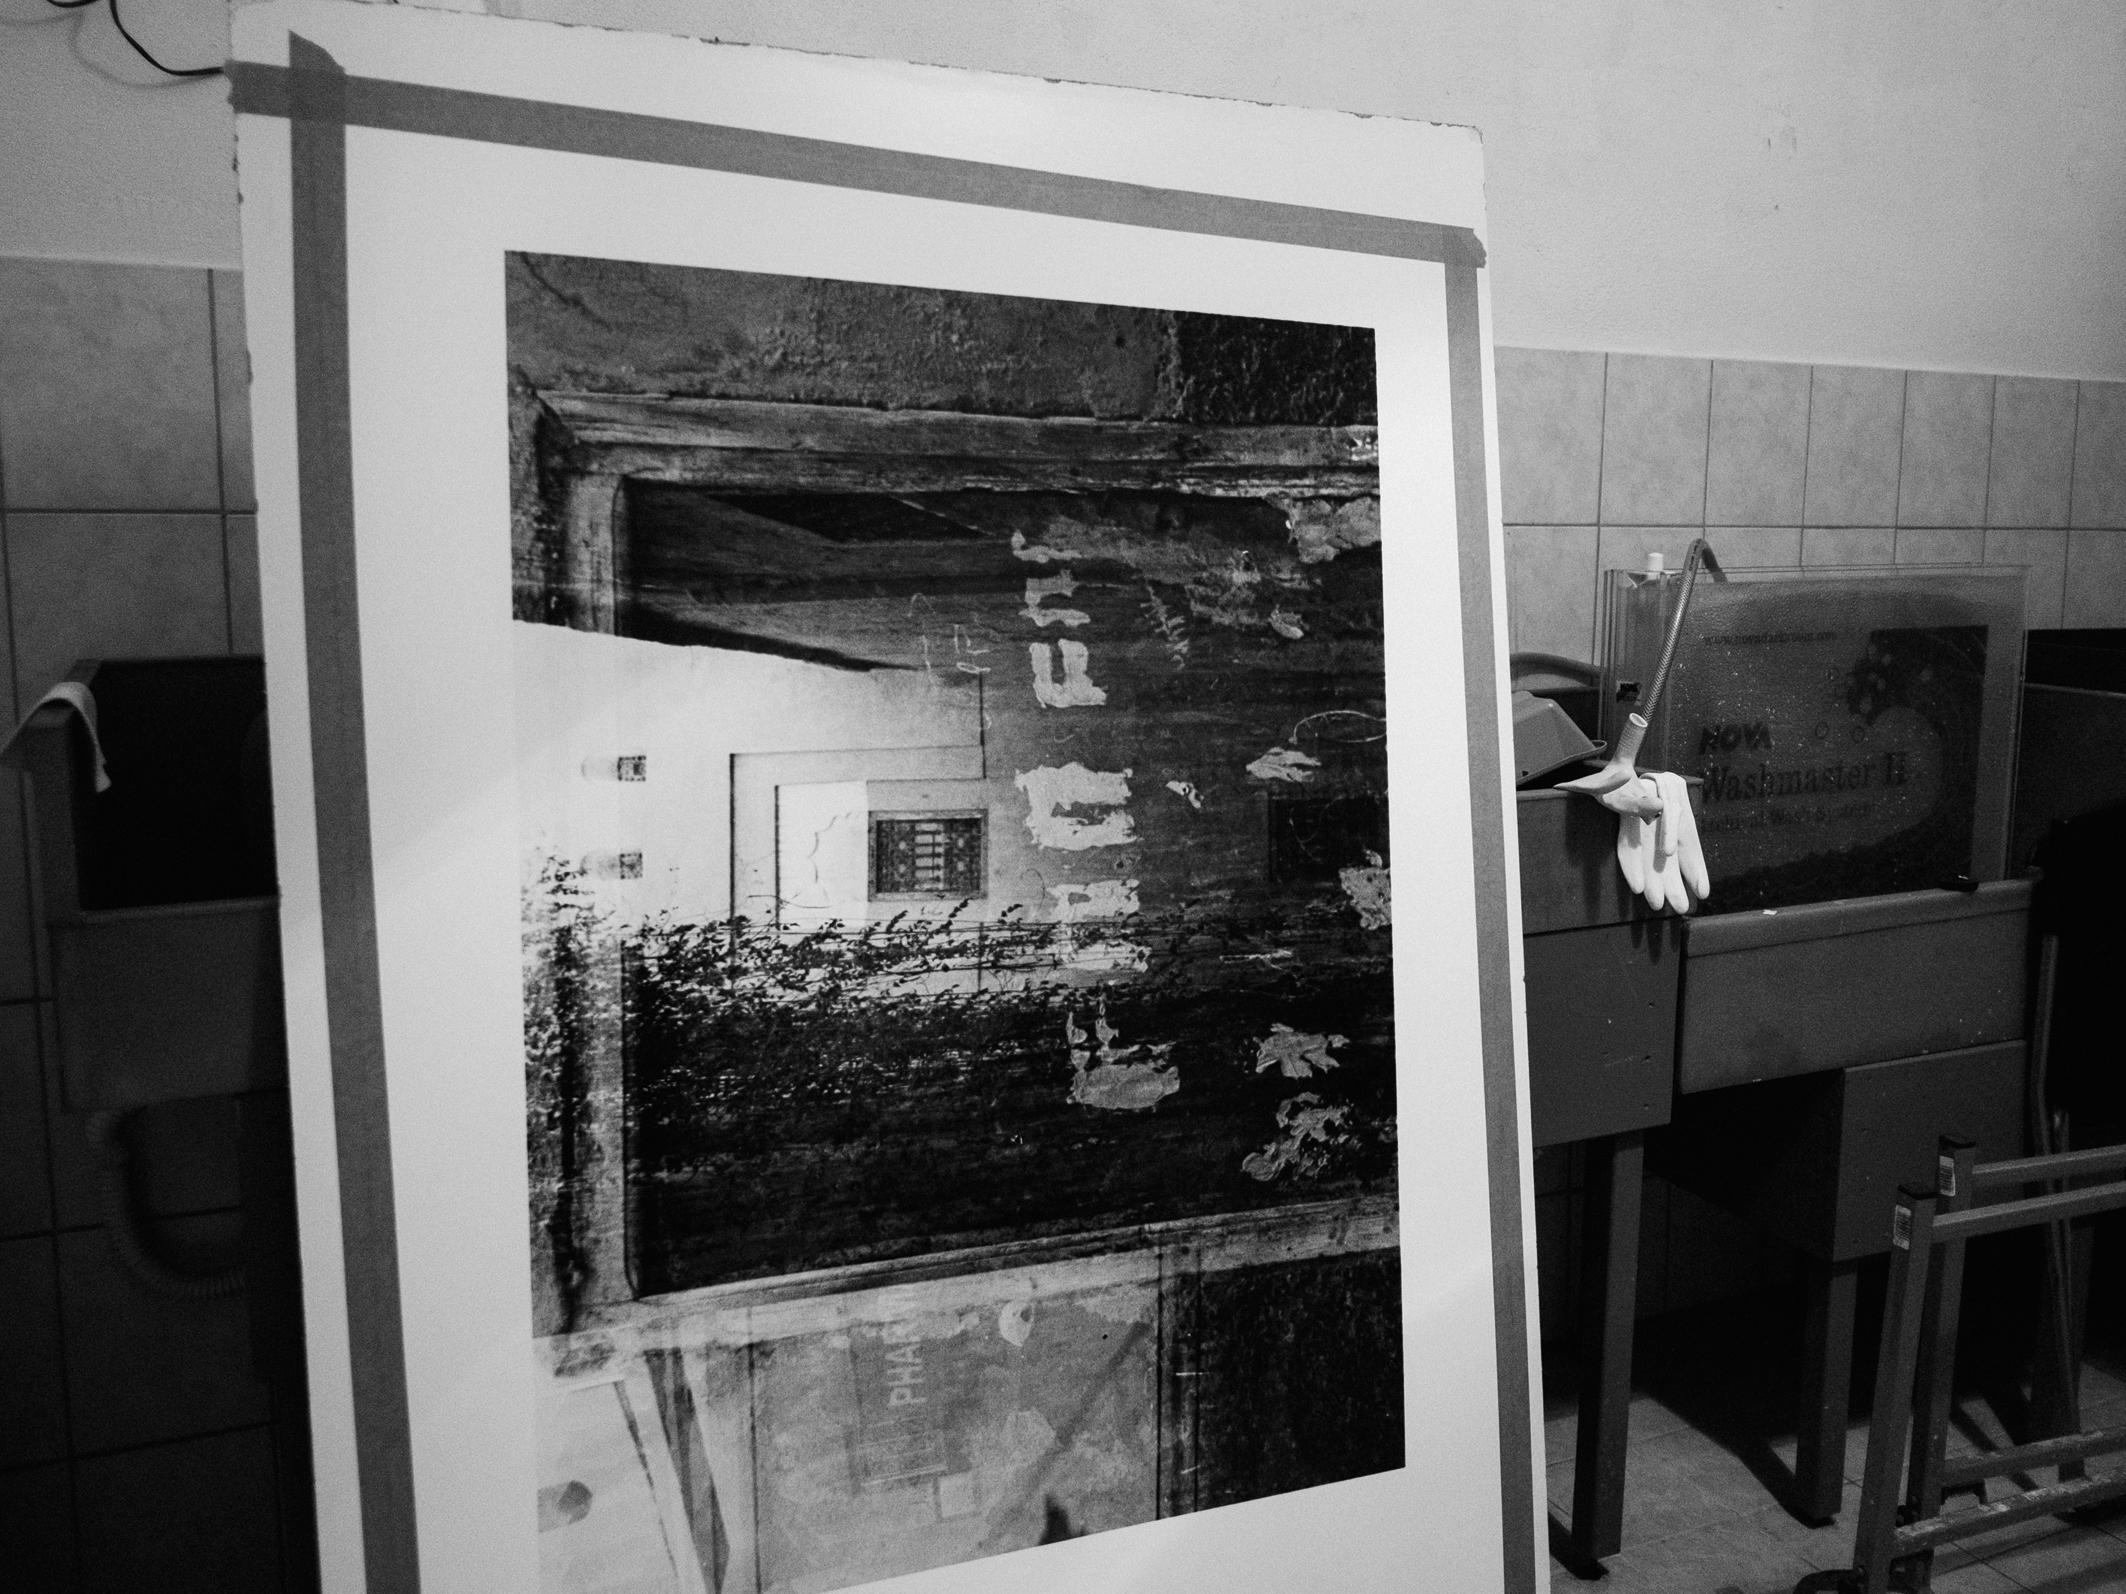 darkroom, drying of print